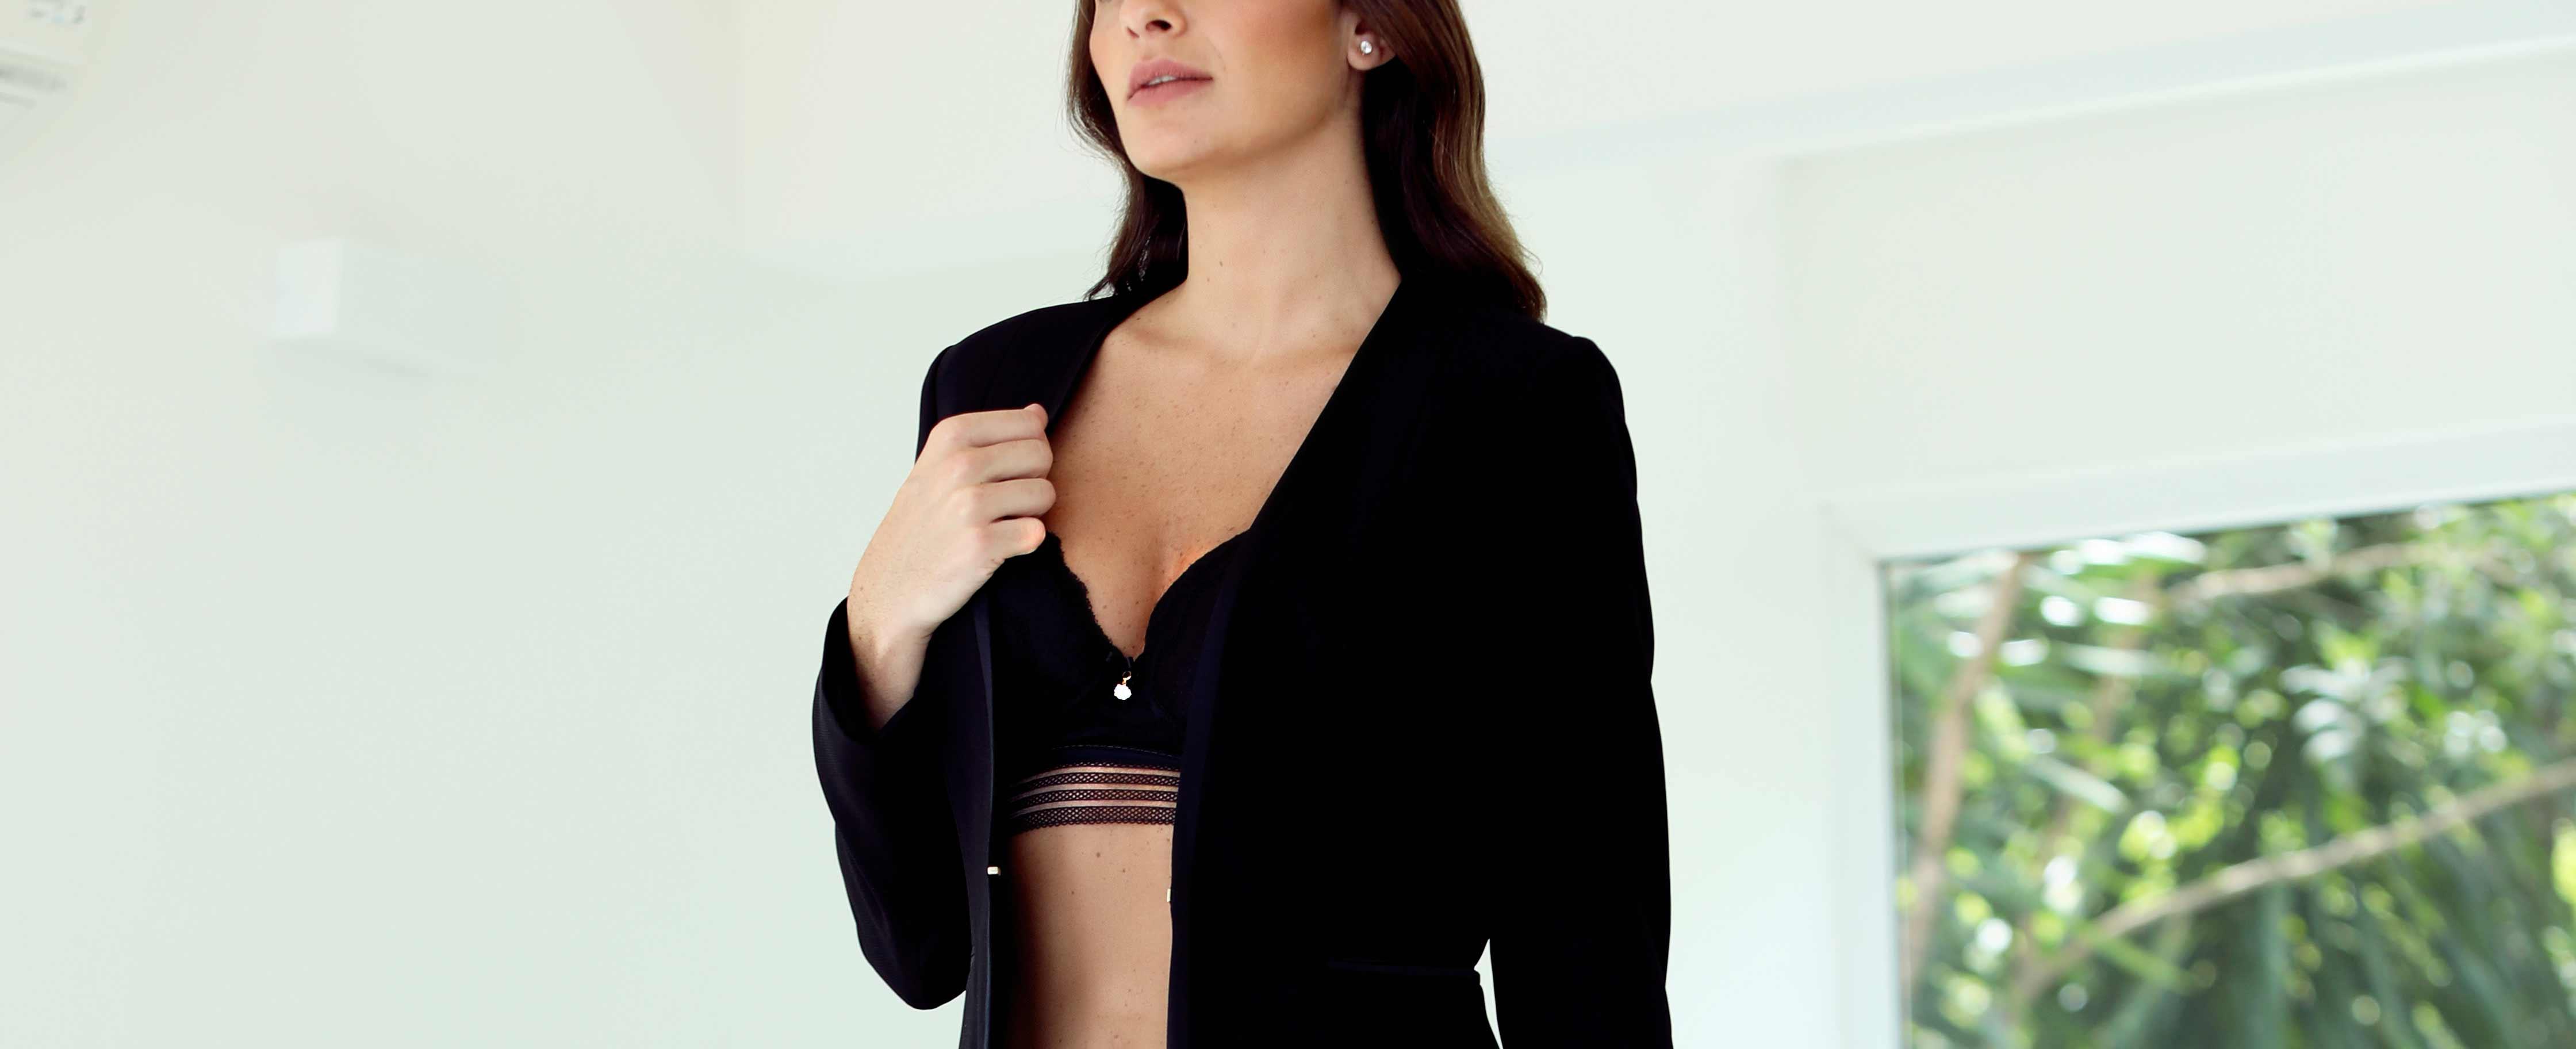 Modelo vestindo blazer preto e sutiã preto.